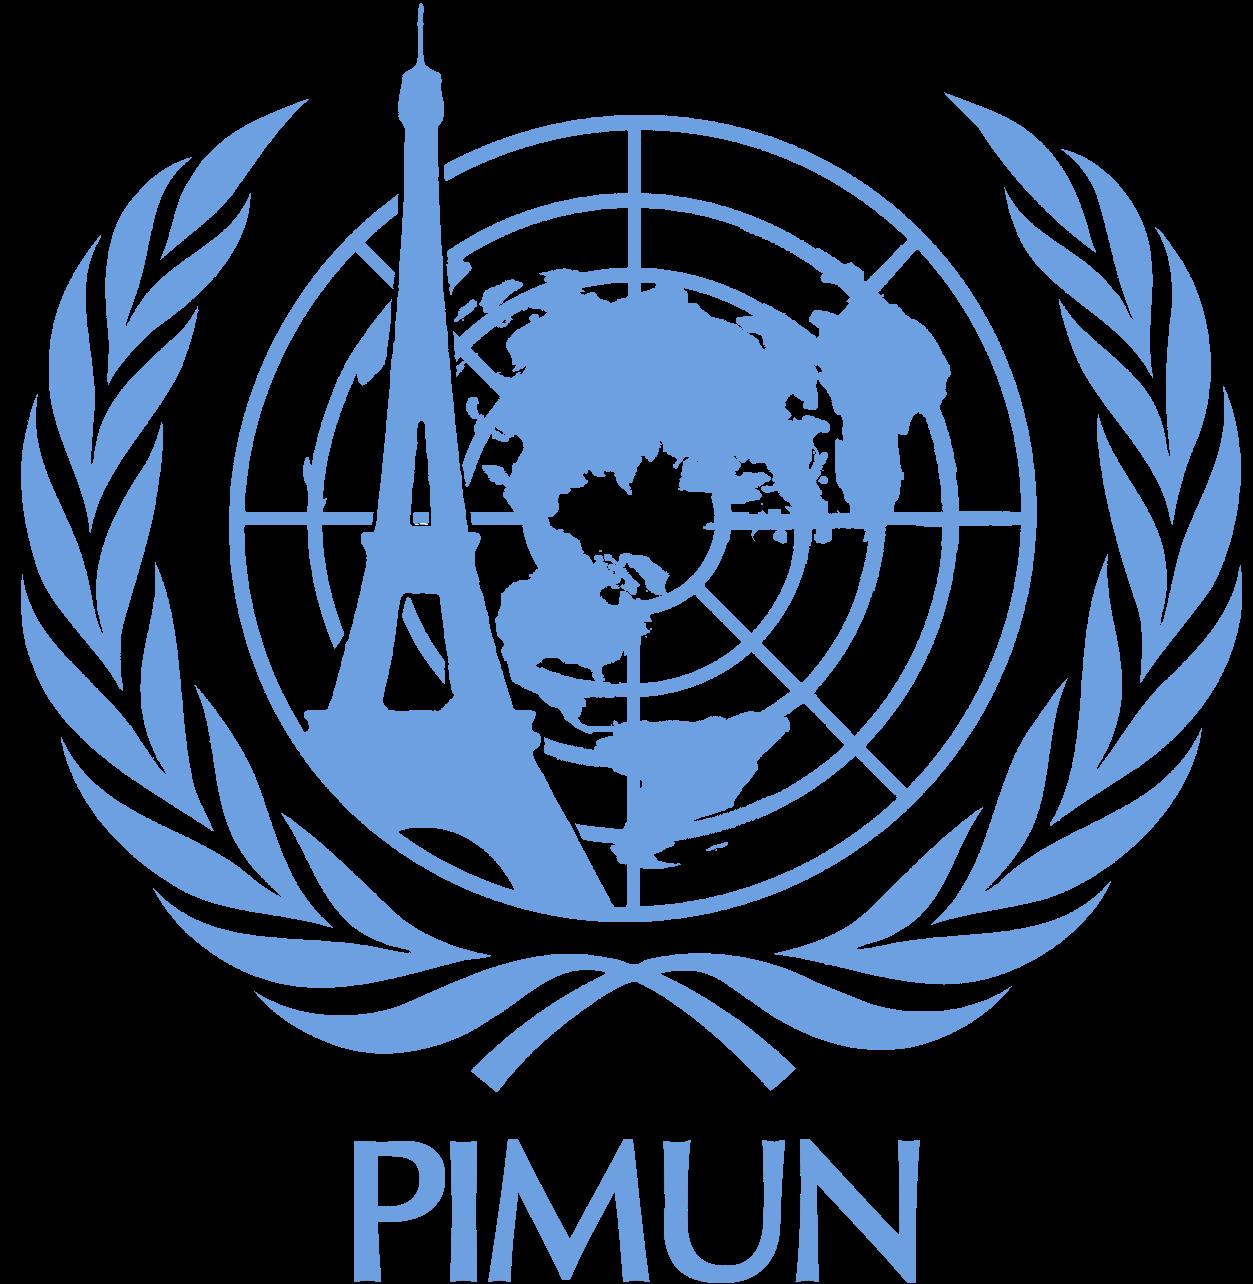 PIMUN 2020